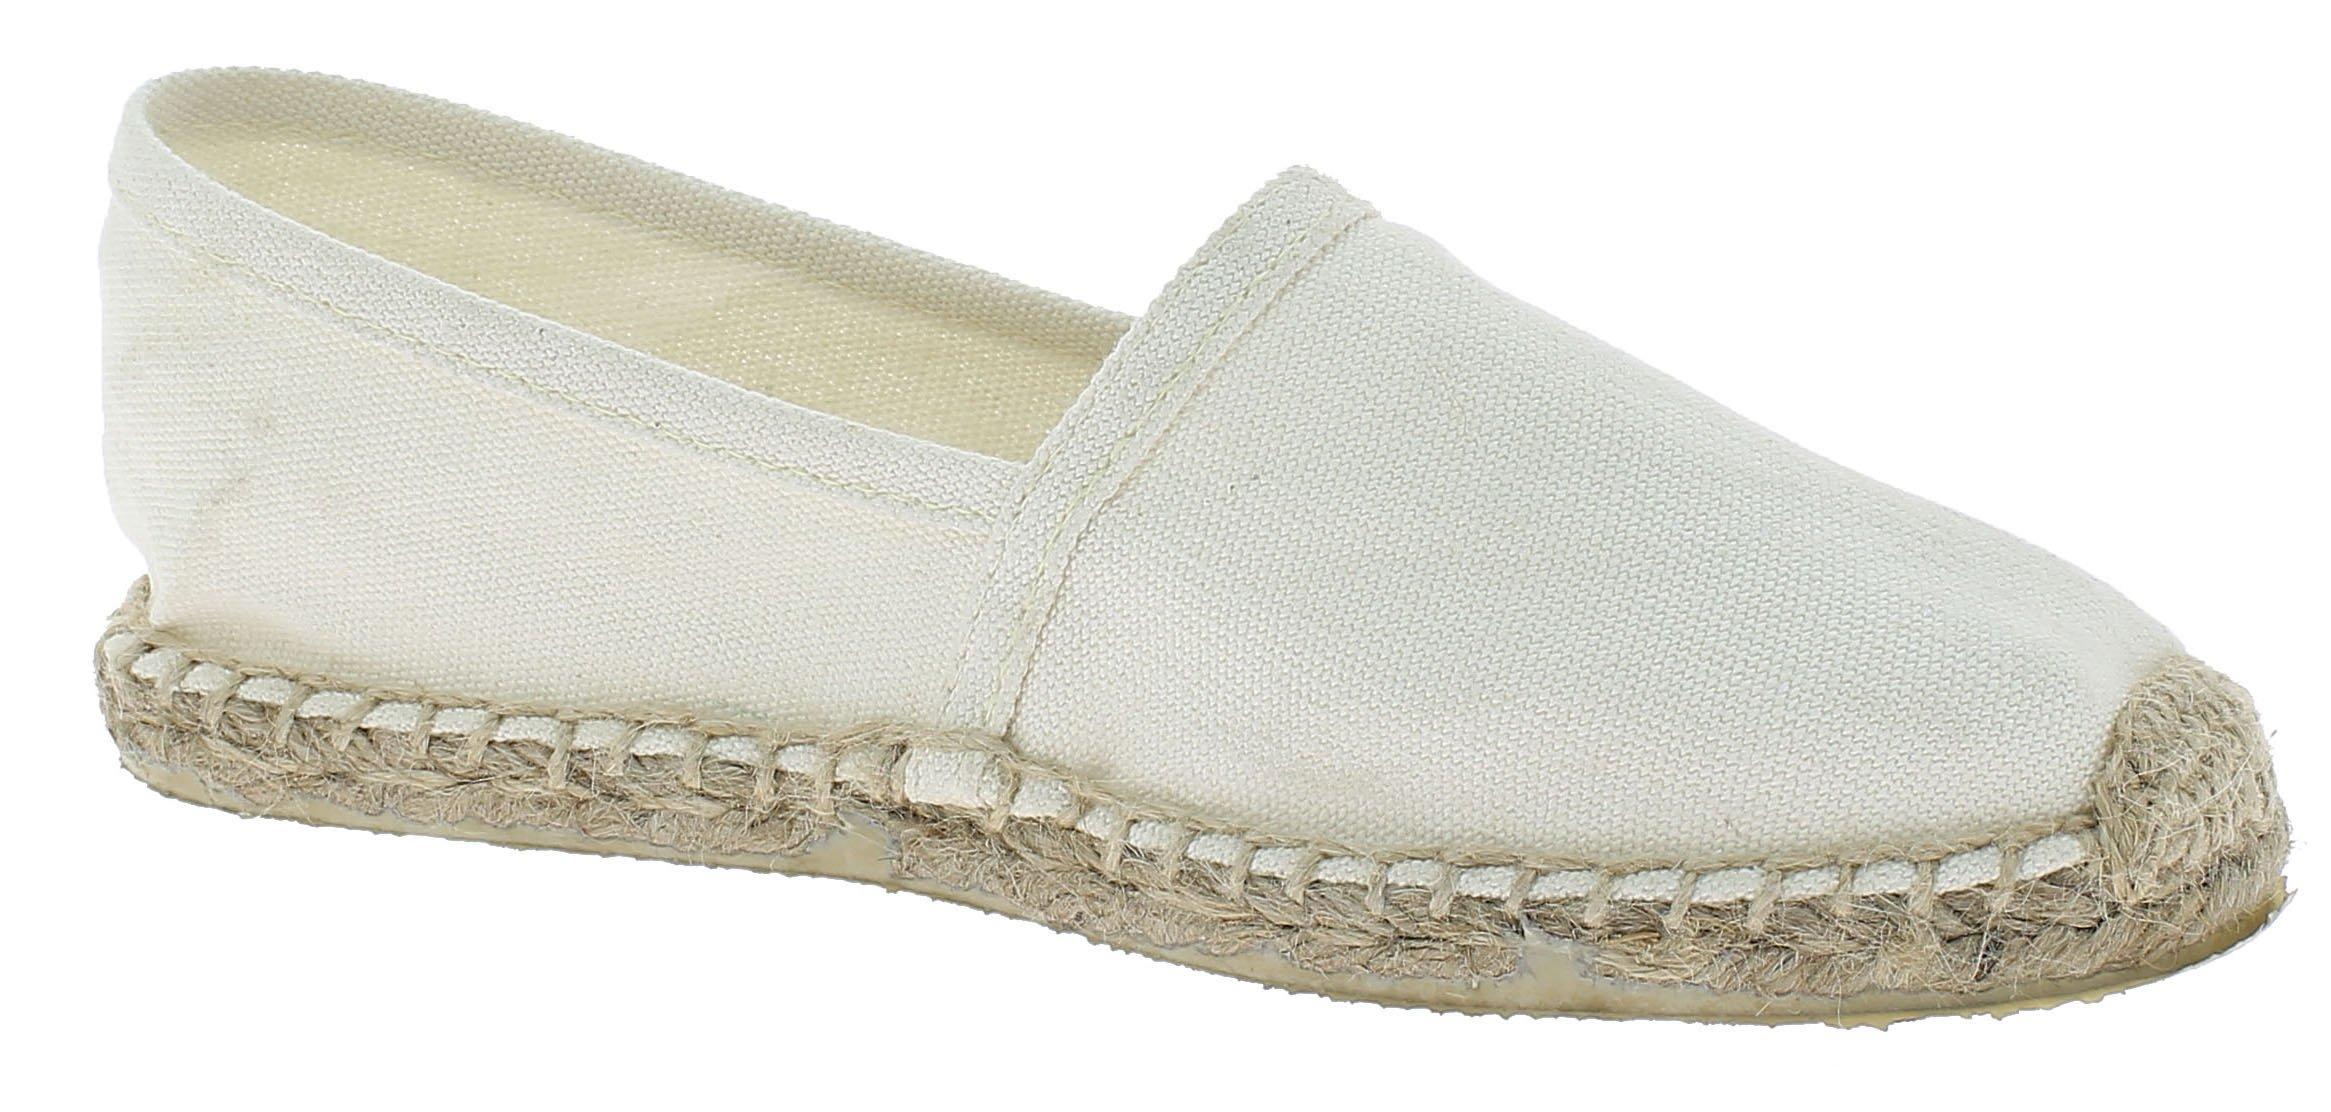 TOPWAY Γυναικείο Casual B604973 Μπεζ - IqShoes - B604973 beige 39/1/7/25 παπούτσια  προσφορεσ